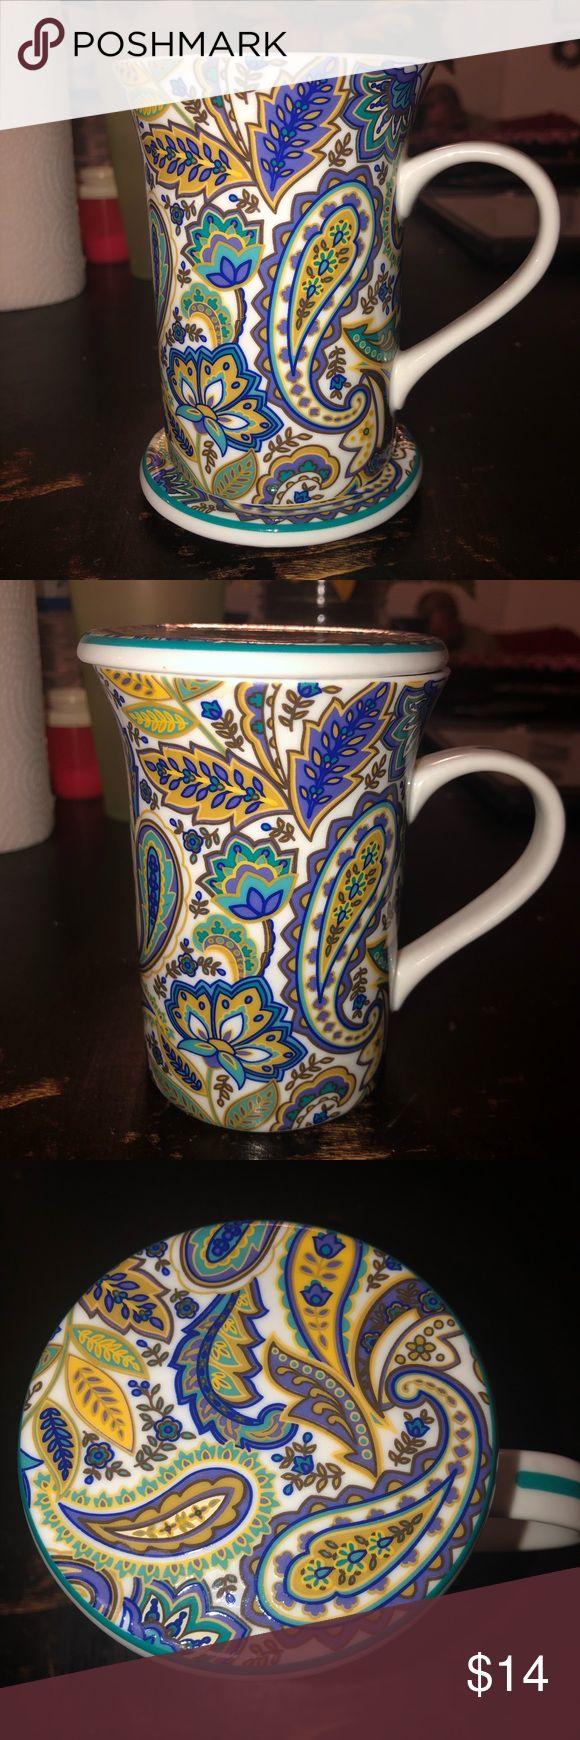 Starbucks coffee mug with lid/coaster Starbucks coffee